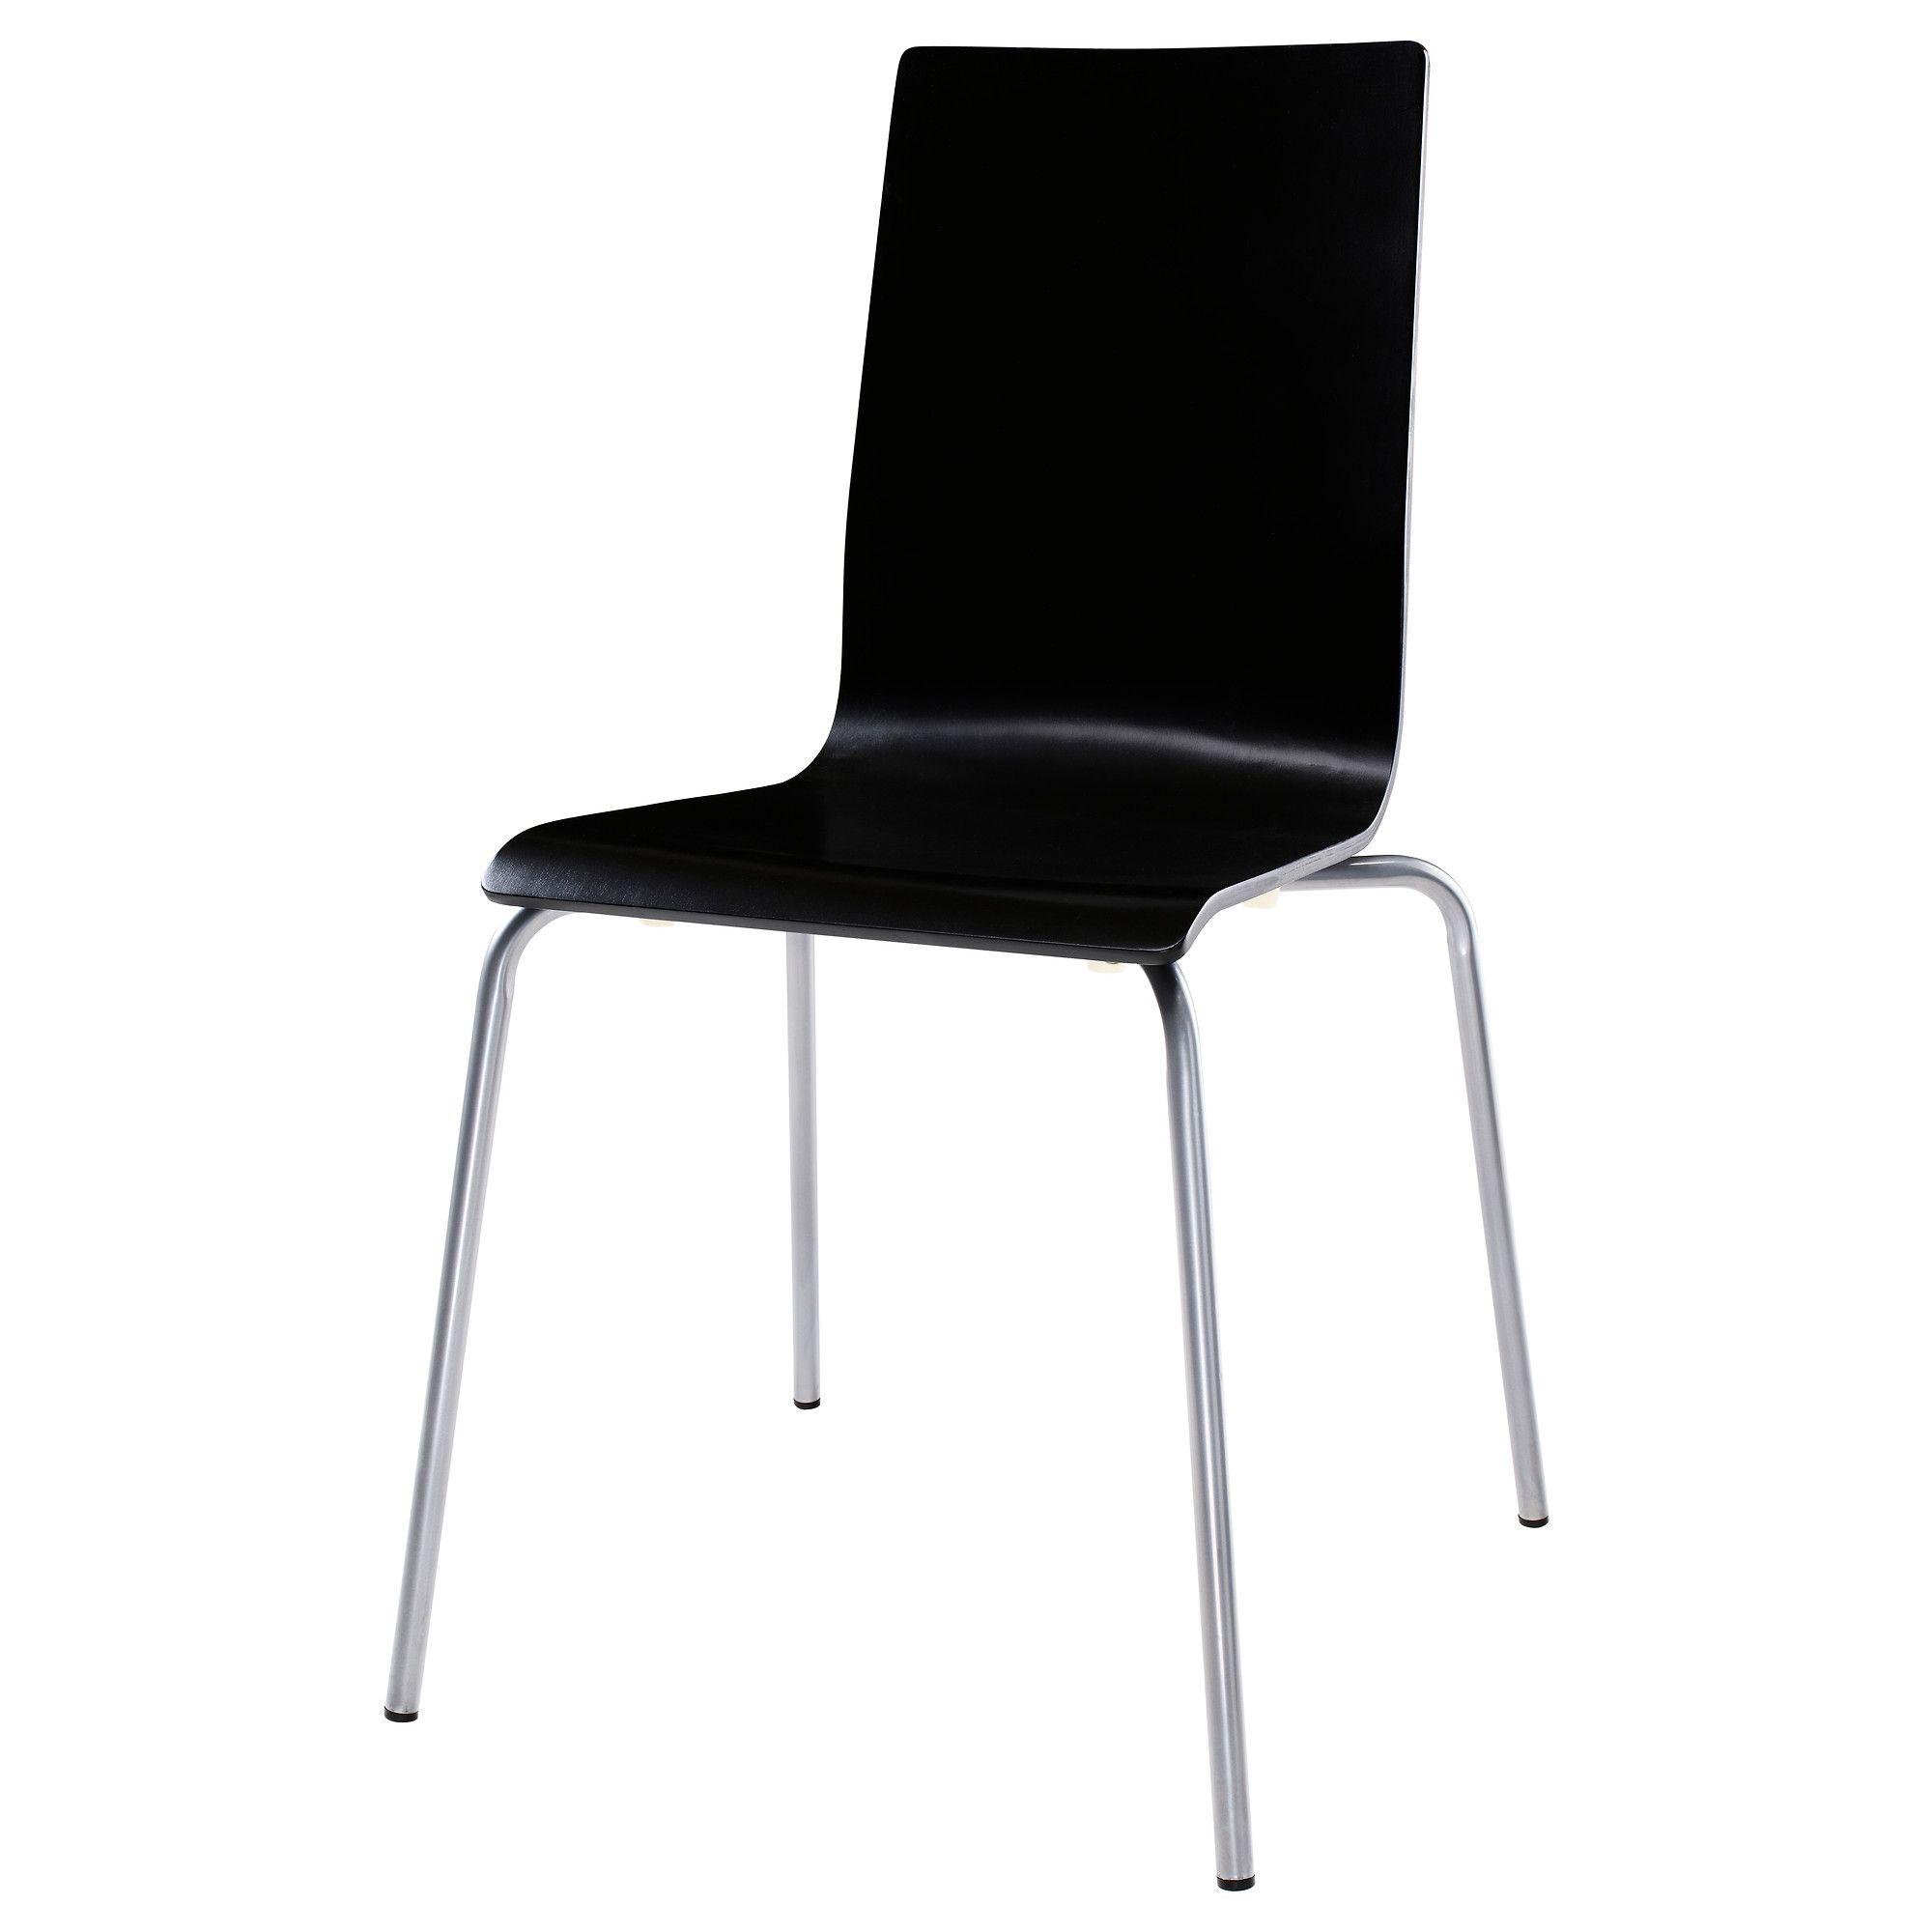 martin stuhl silberfarben schwarz ikea drossel. Black Bedroom Furniture Sets. Home Design Ideas